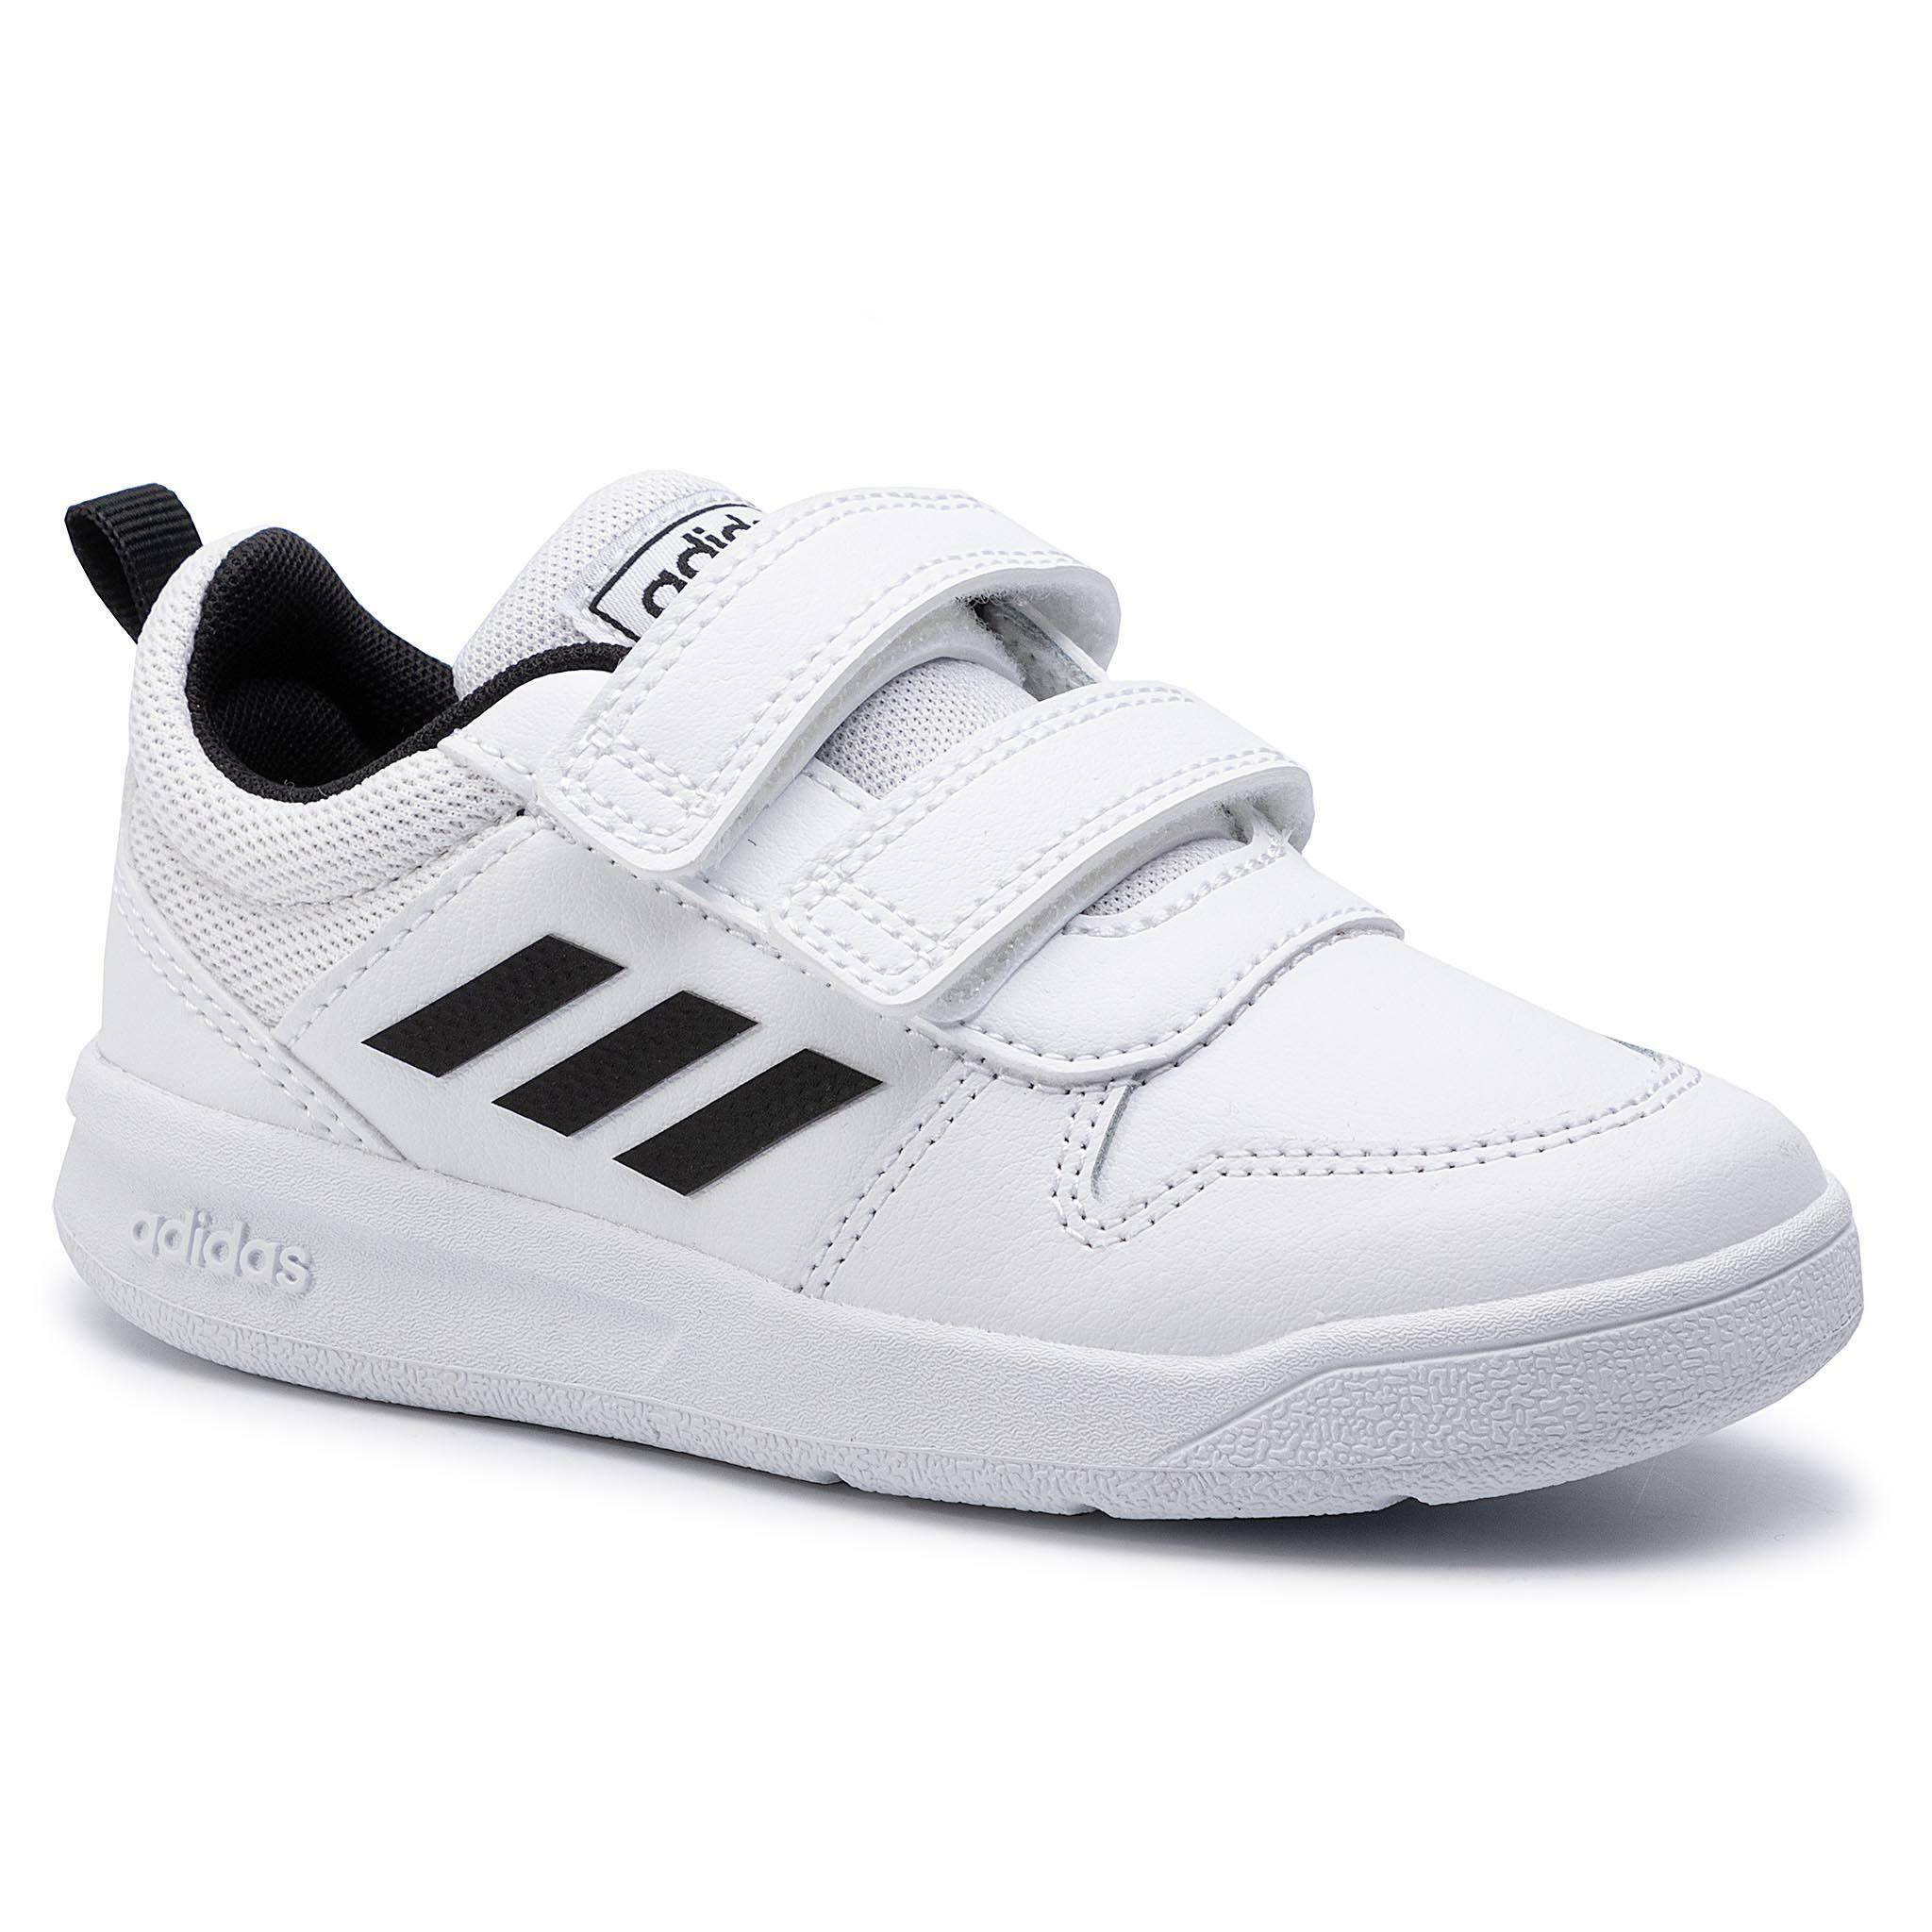 adidas adidas tensaur i bambino strappo sportivo ee1103 bianco